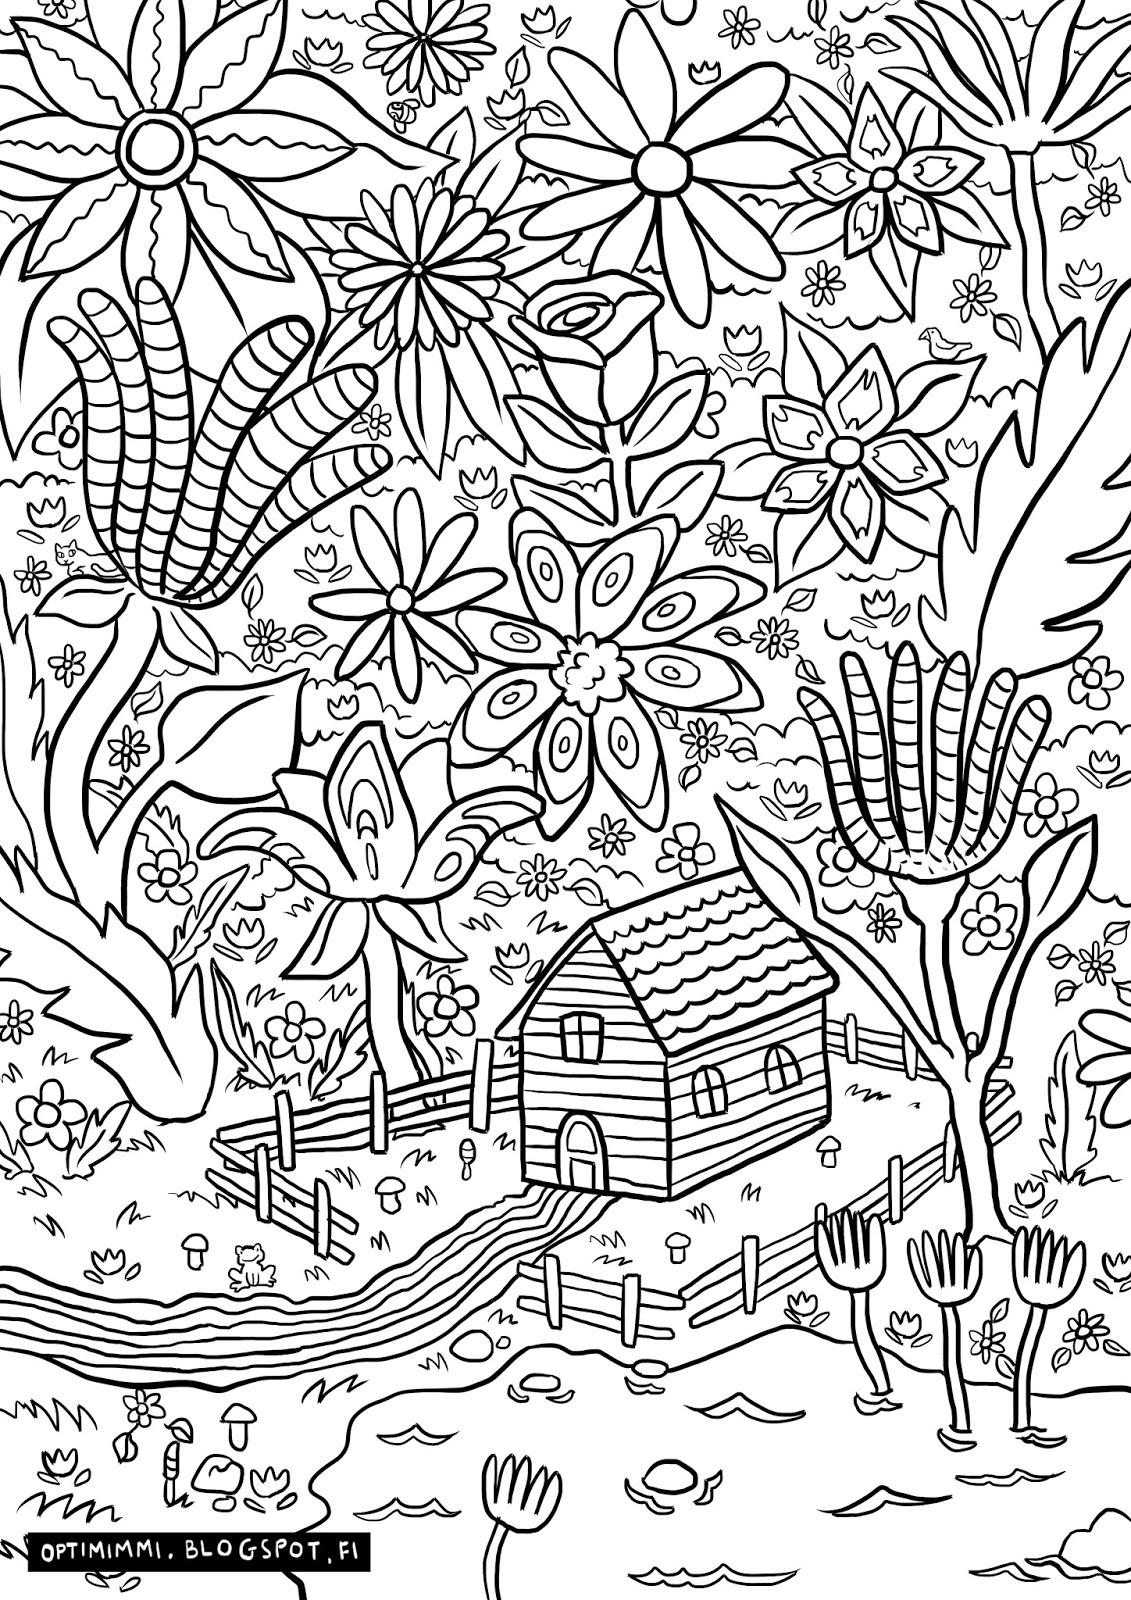 OPTIMIMMI: A paradise (a coloring page) / Paratiisi ...